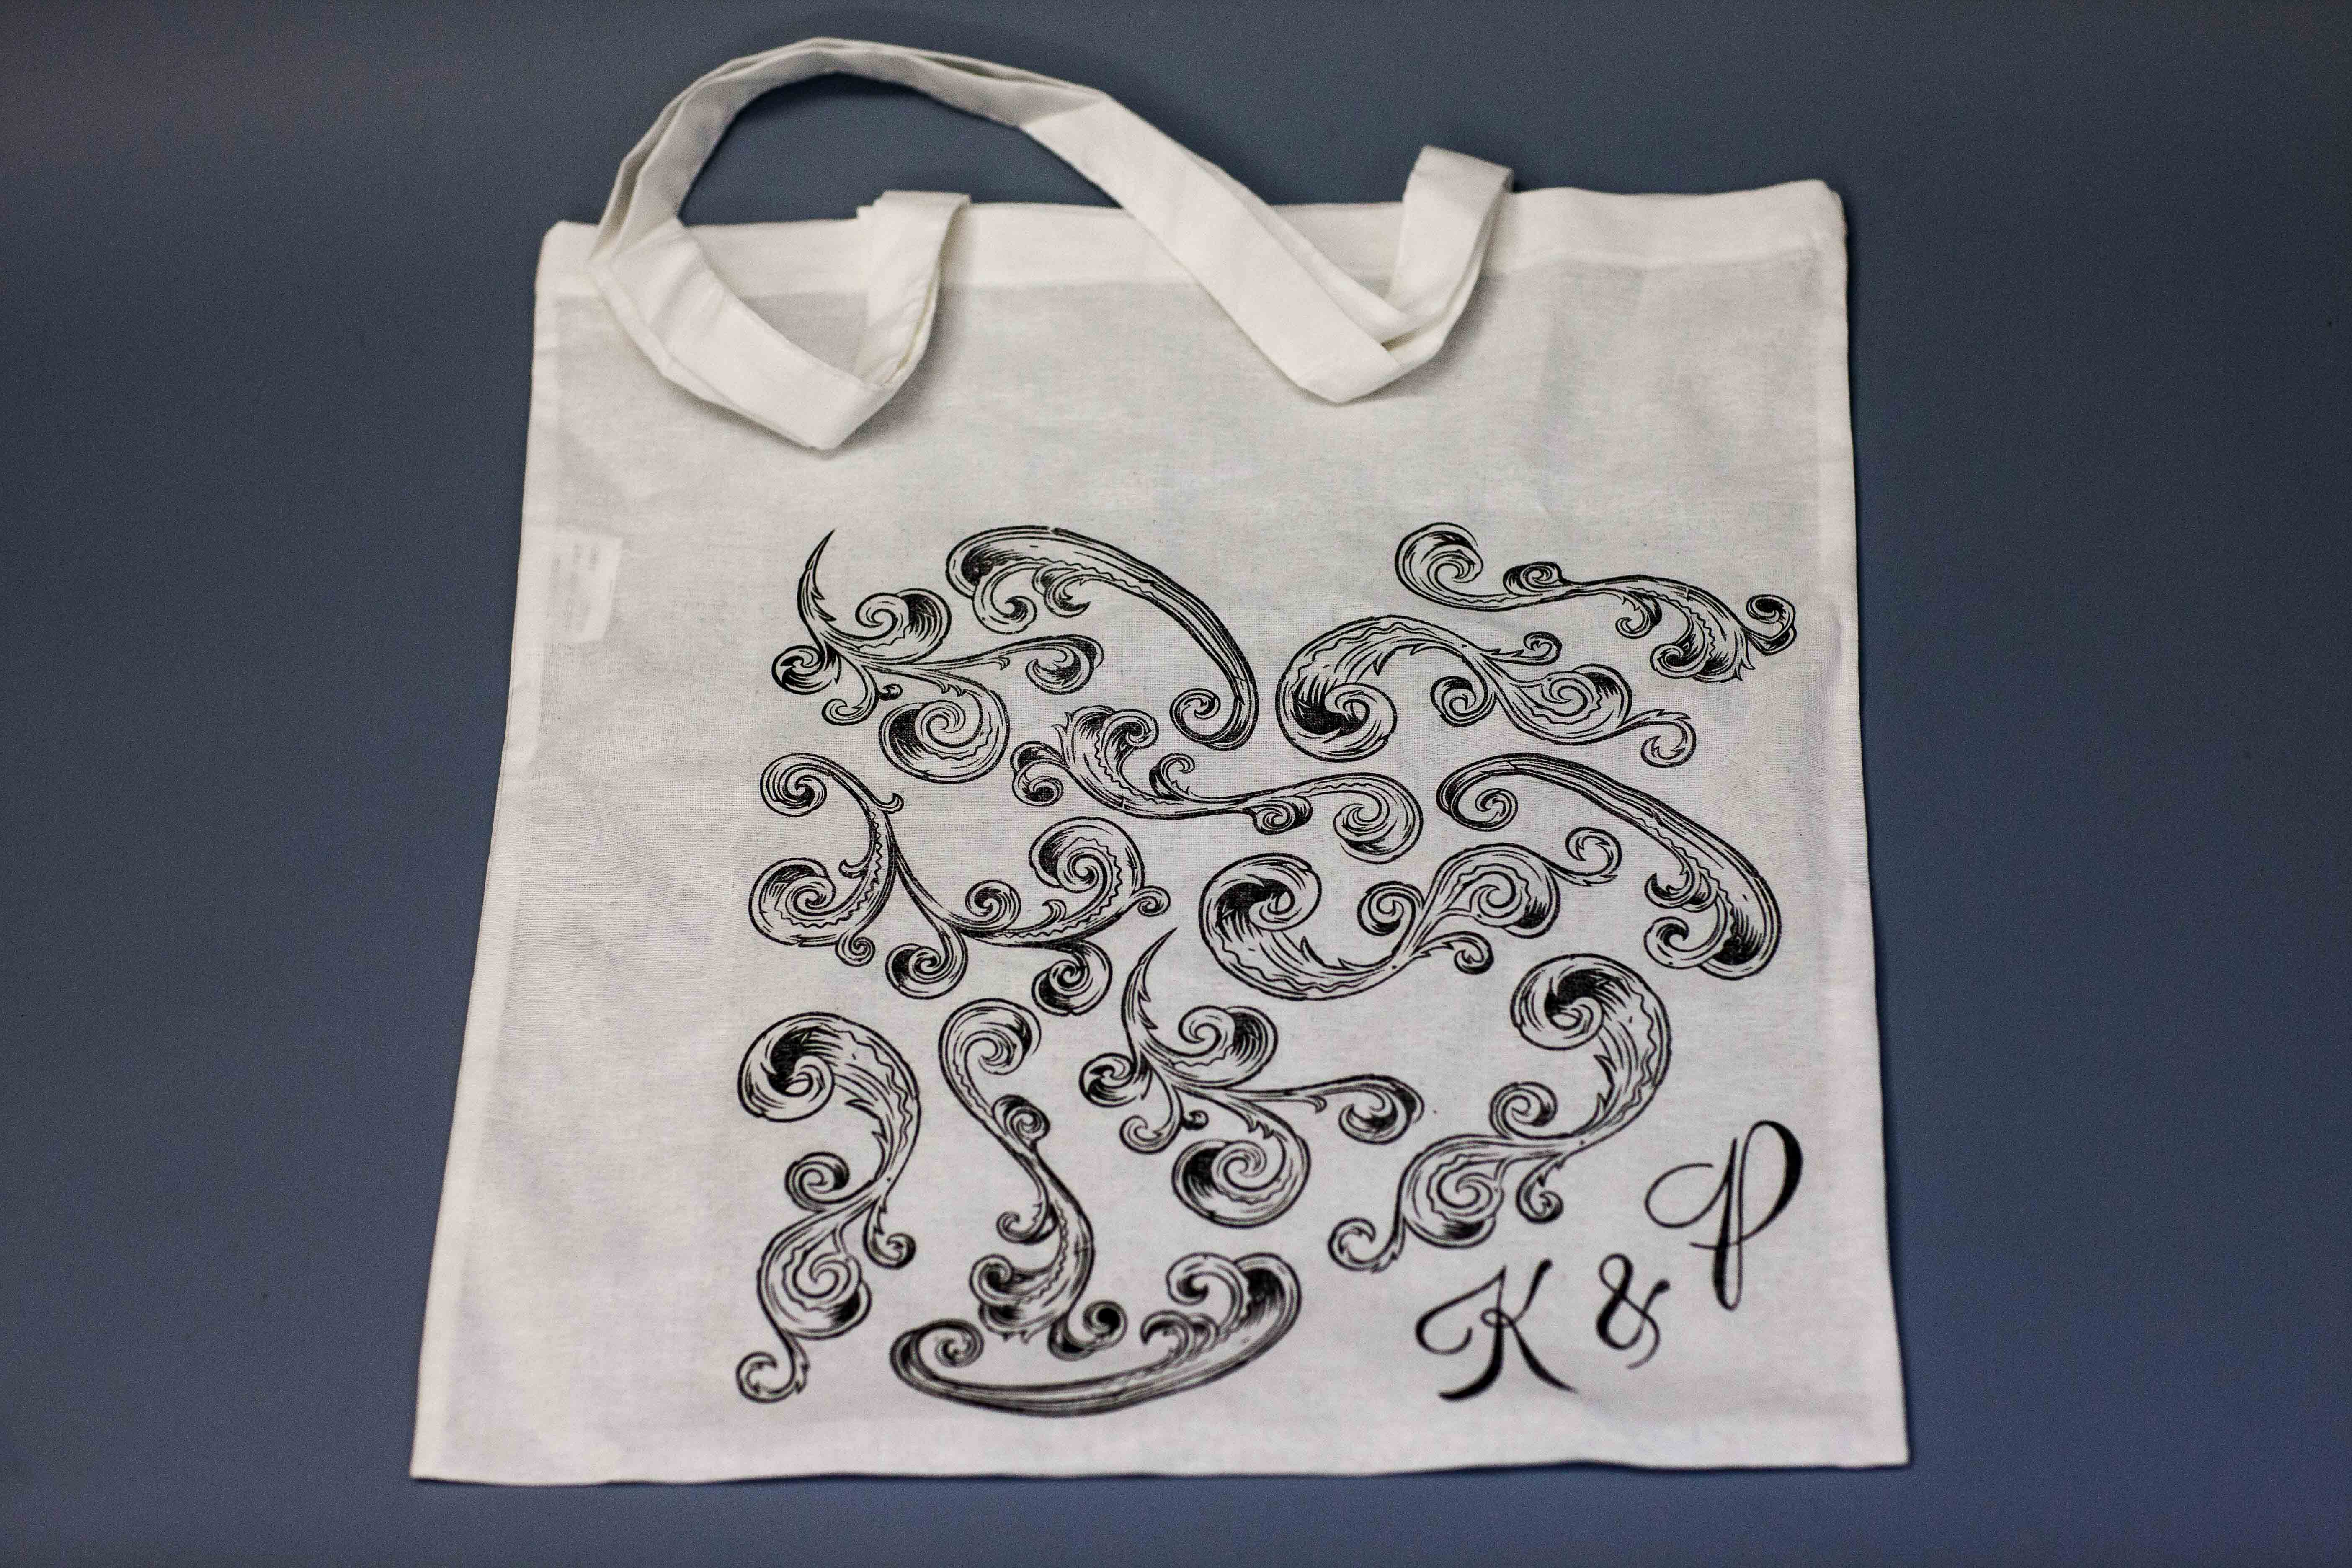 Designed and printed bag